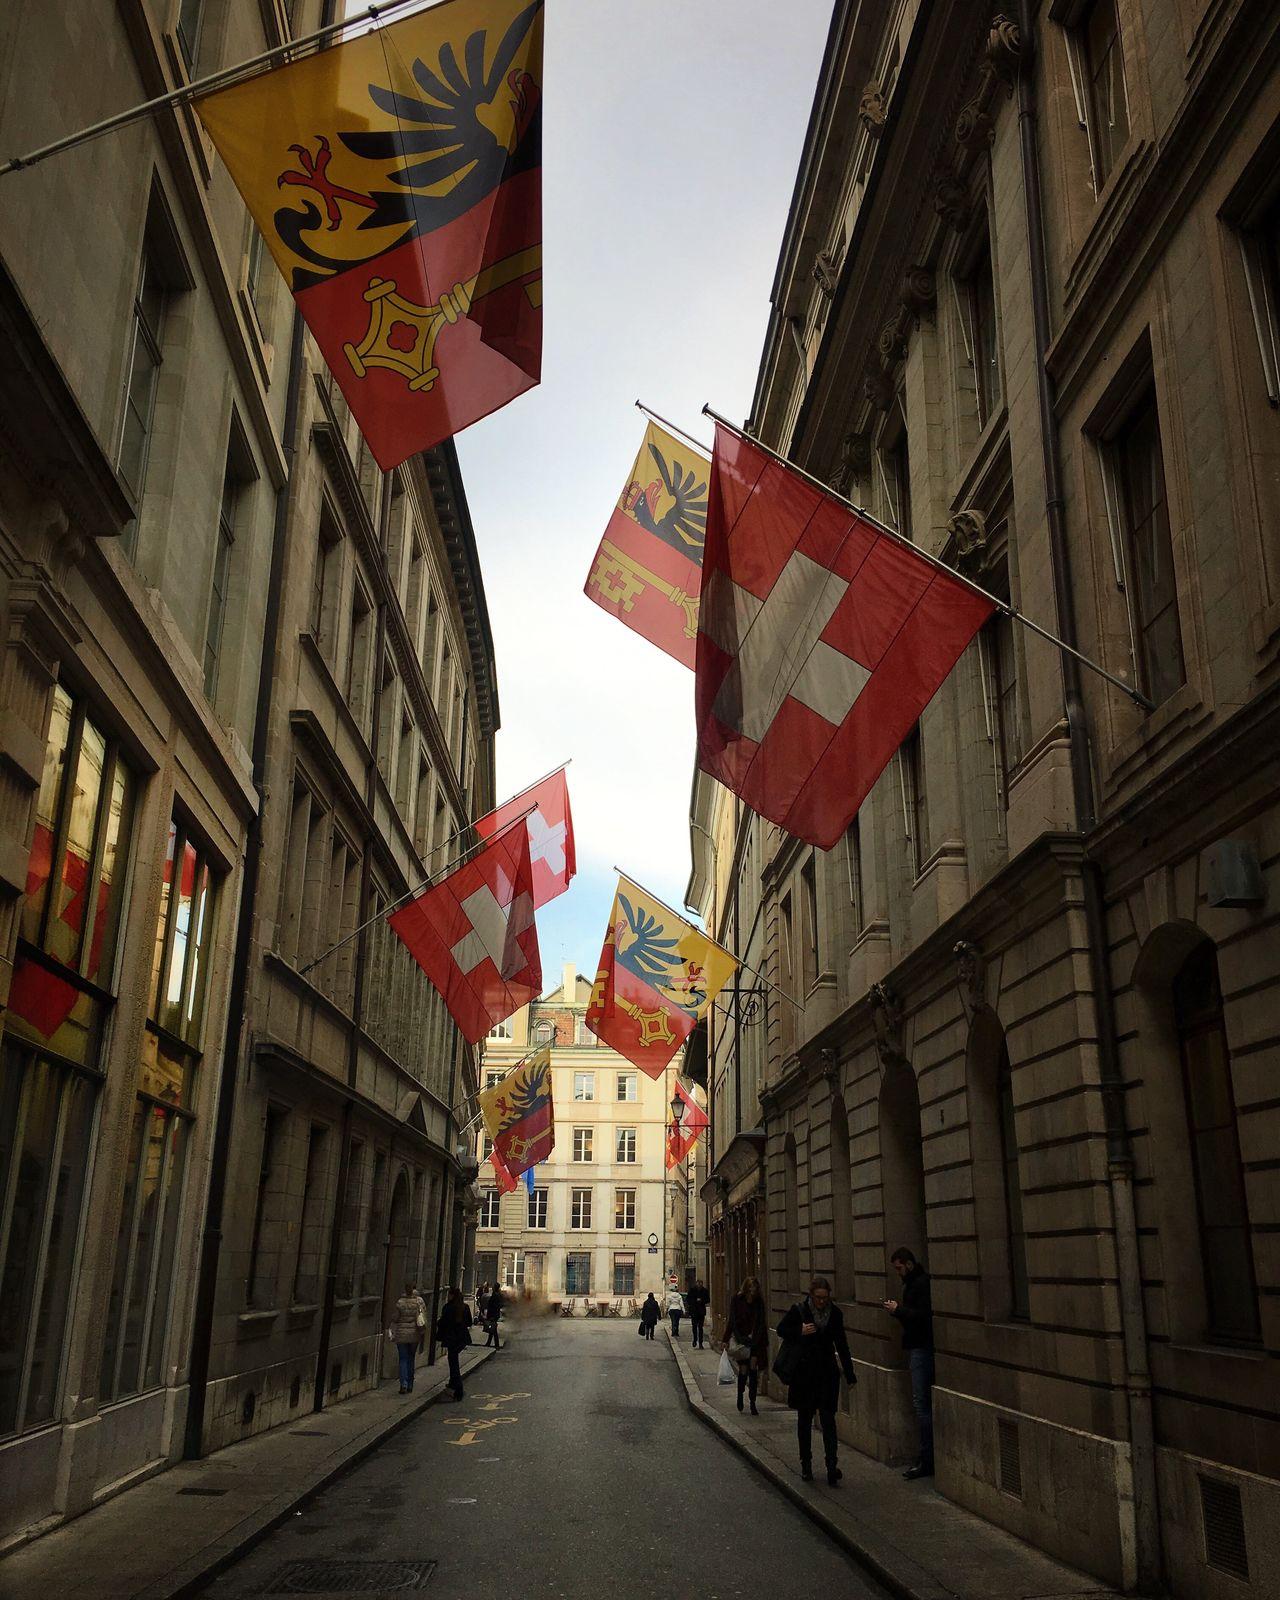 Geneva Geneve Switzerland Switzerlandpictures Swiss National Pride NationalPride Europe Flag Architecture Street Patriotism Cobblestone Streetphotography City